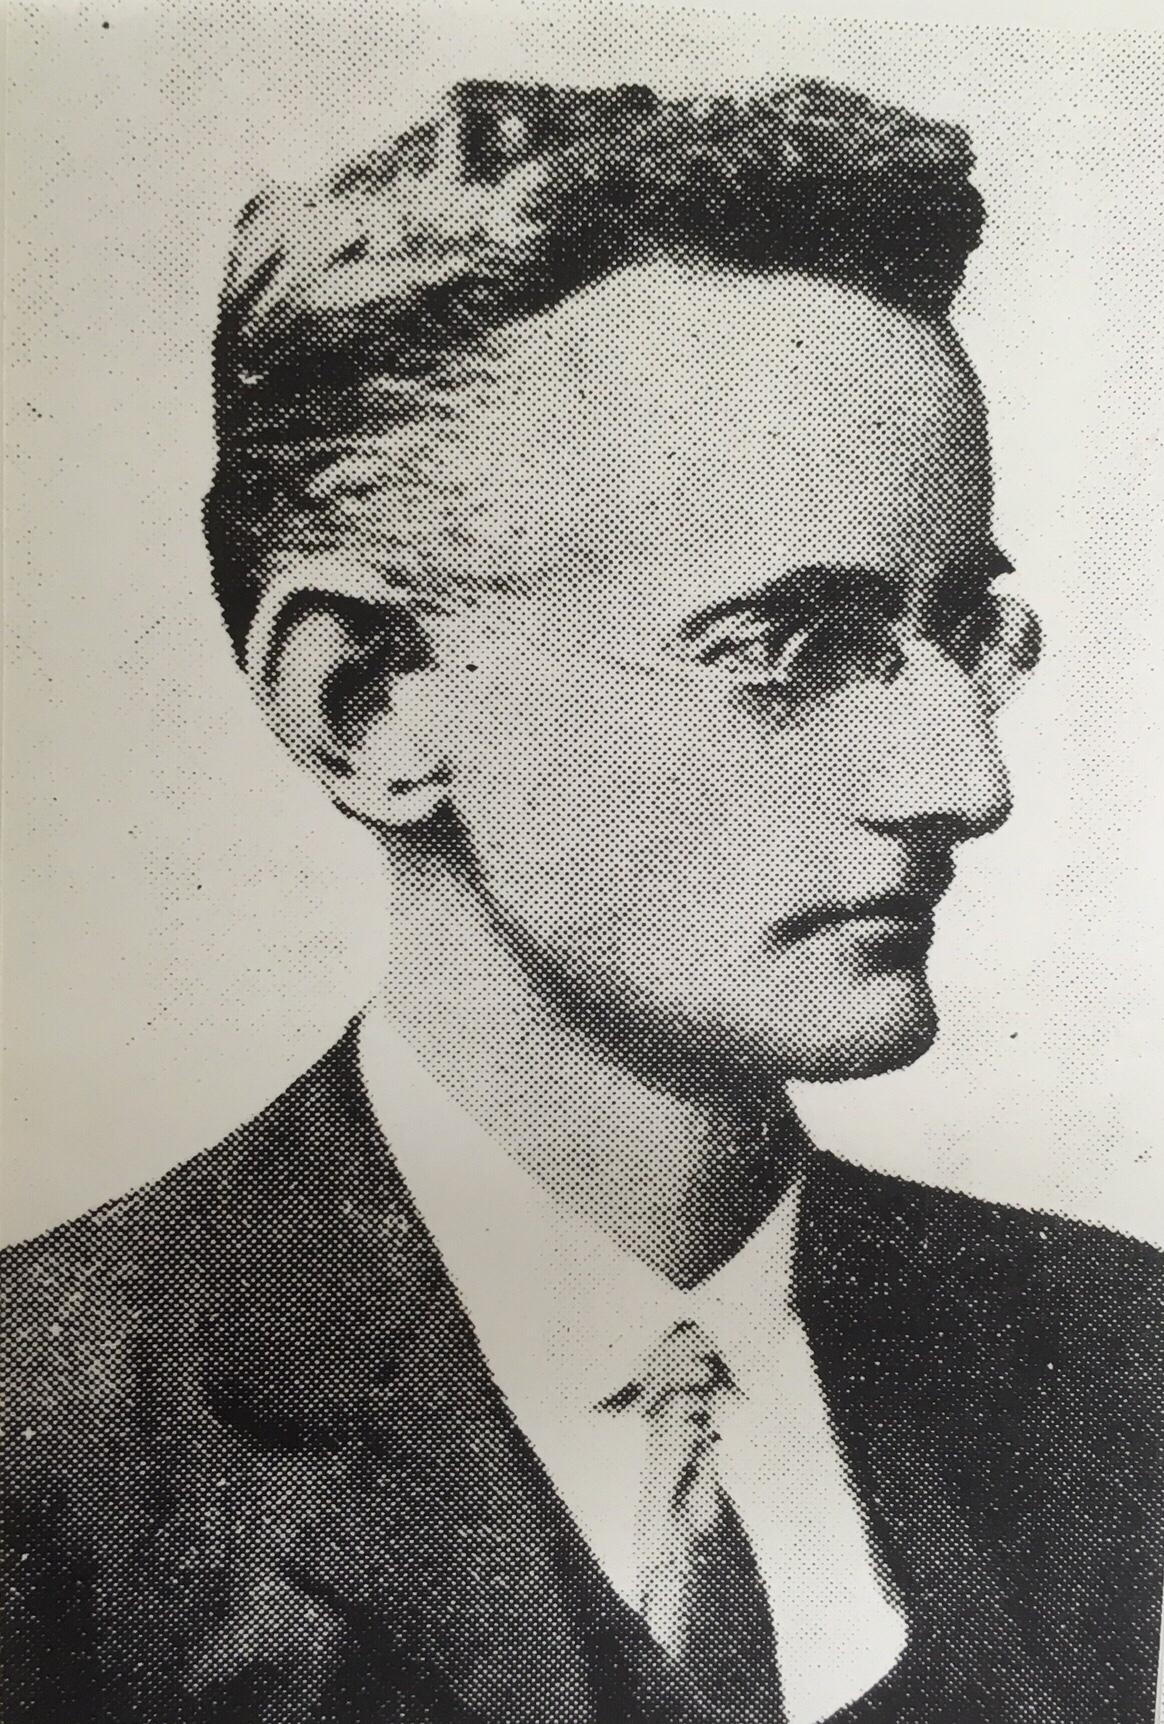 Reverend Douglas Price